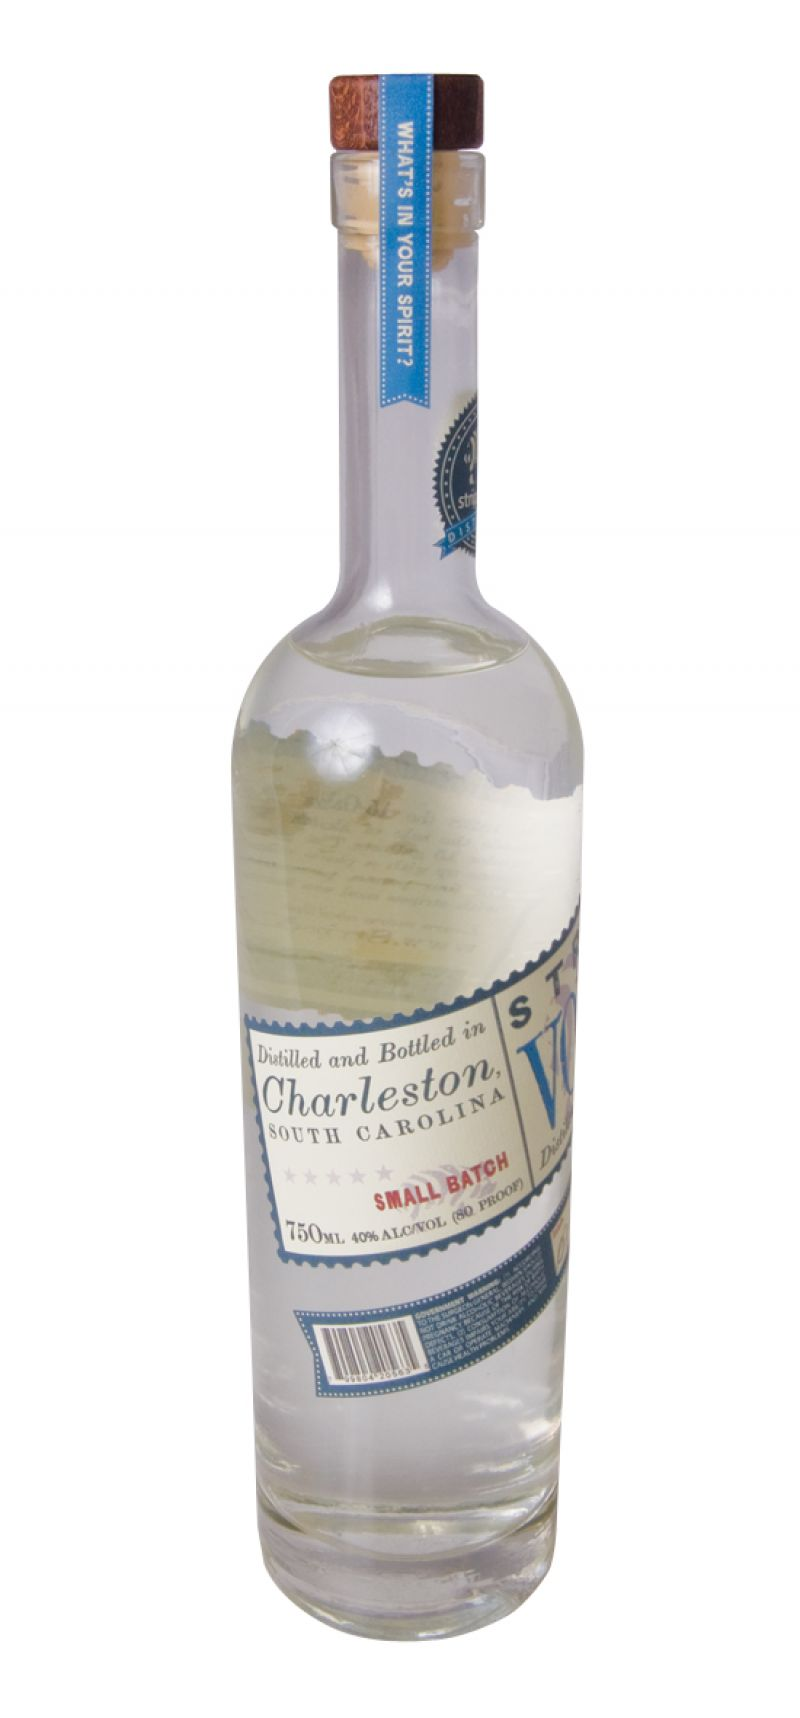 "High Wire Hometown Vodka, $27.99, <a href=""http://www.moultrienews.com/article/20131019/MN02/131019727/0/-x201c-i-didn-x2019-t-know-yall-were-cops-x201d"">http://www.moultrienews.com/article/20131019/MN02/131019727/0/-x201c-i-d...</a>"